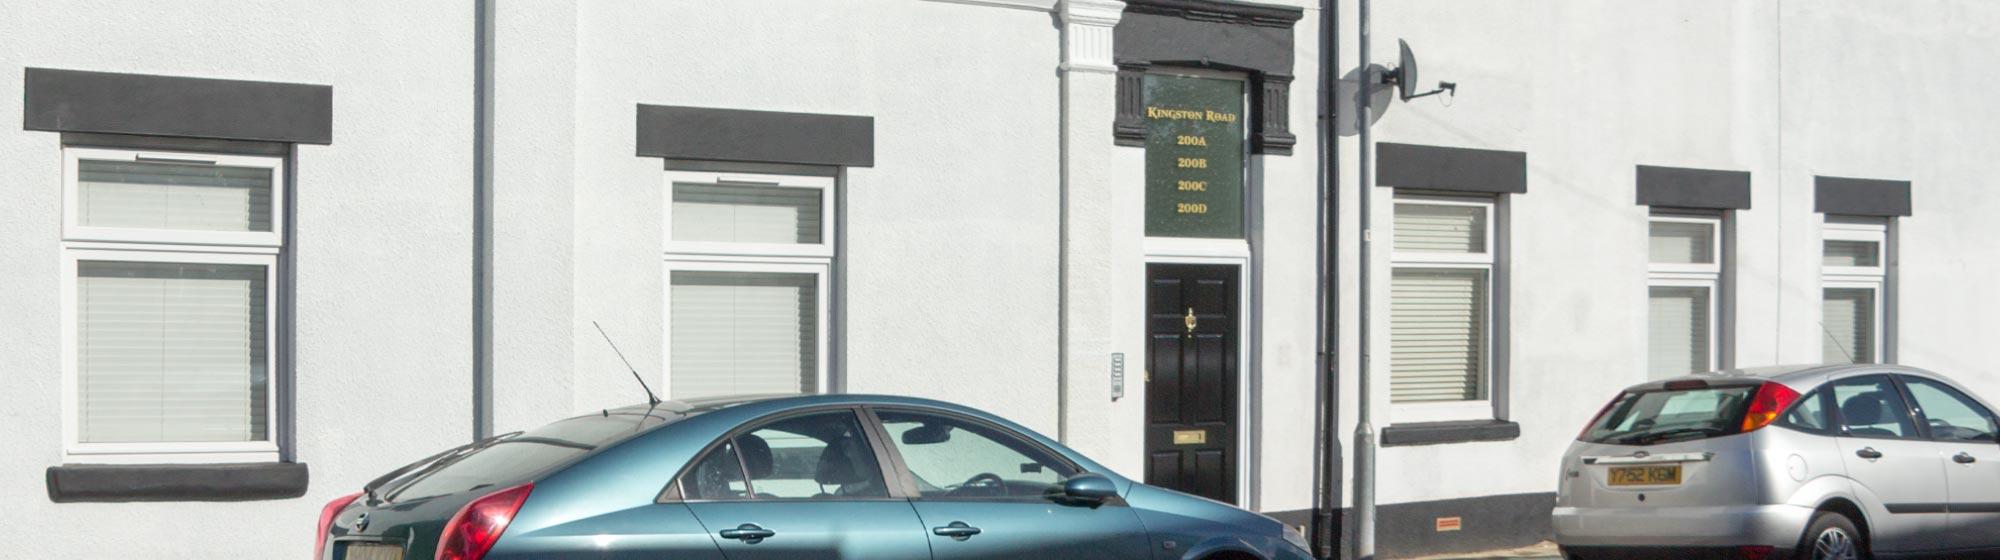 Kingston RoadRENT £820pcm [Ground floor rear] & 200B Kingston Road - Shirlaw Homes Limited pezcame.com